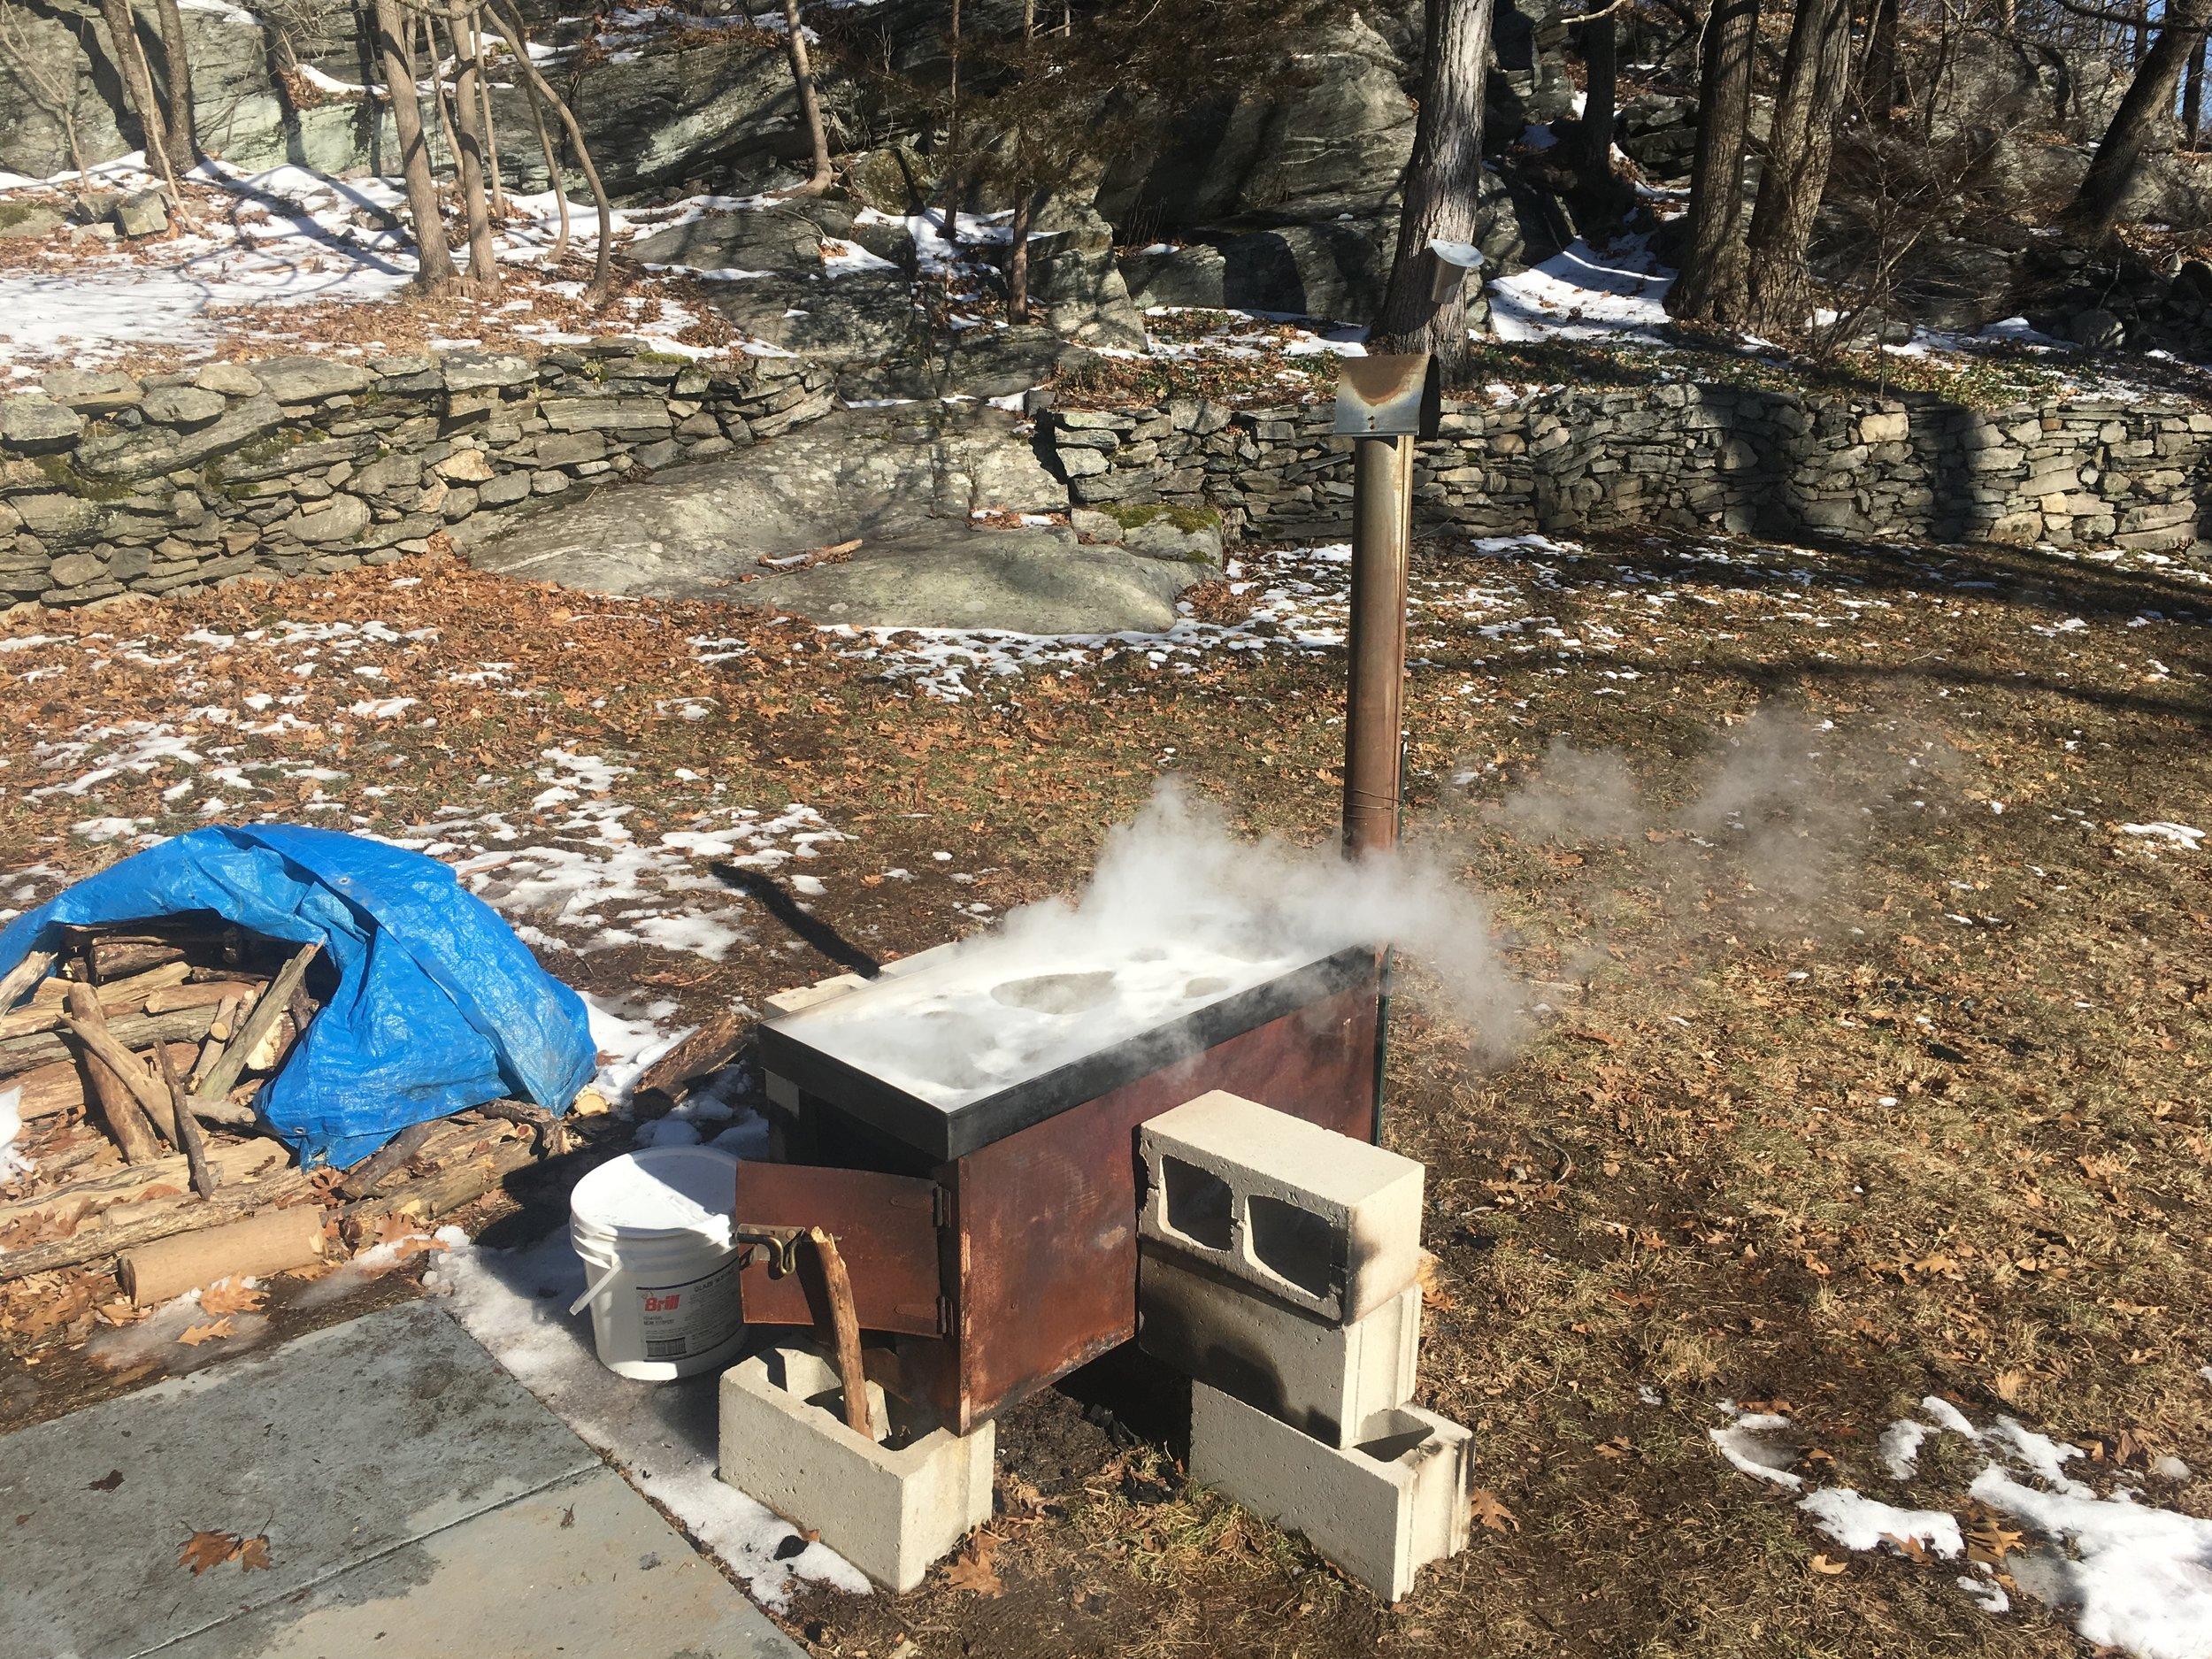 The homemade syrup evaporator